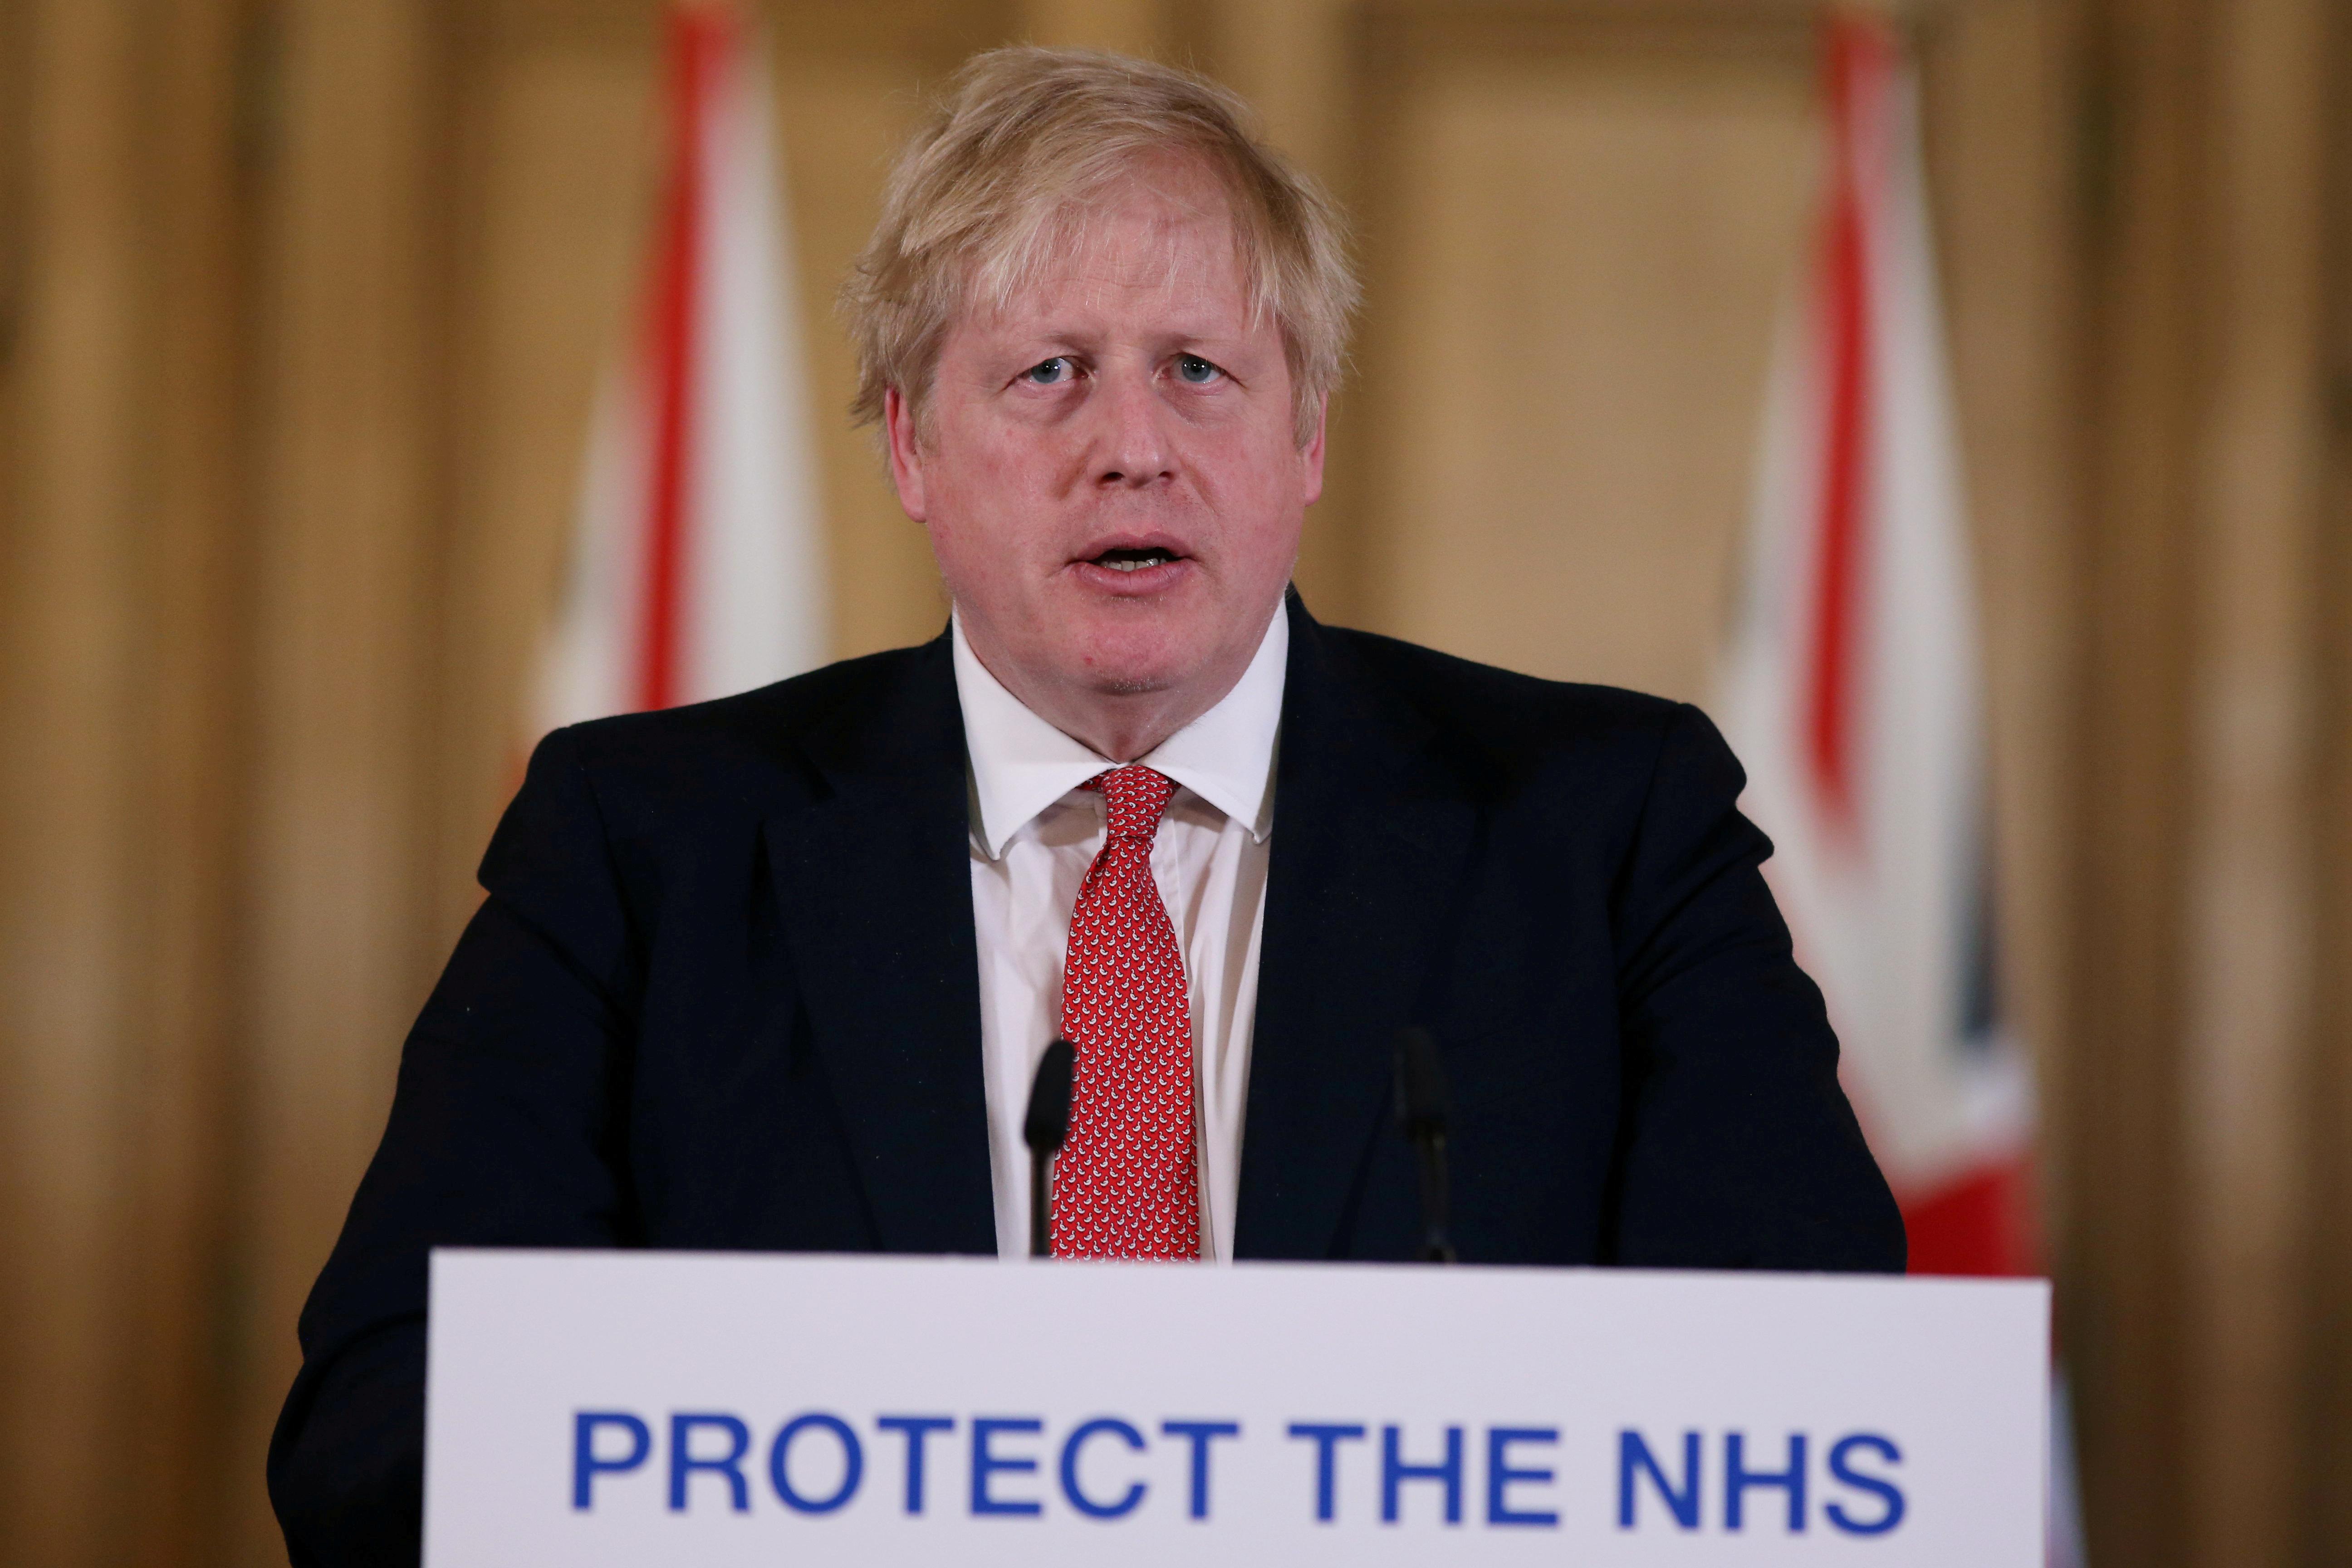 British PM Johnson gives daily address to nation on coronavirus in London